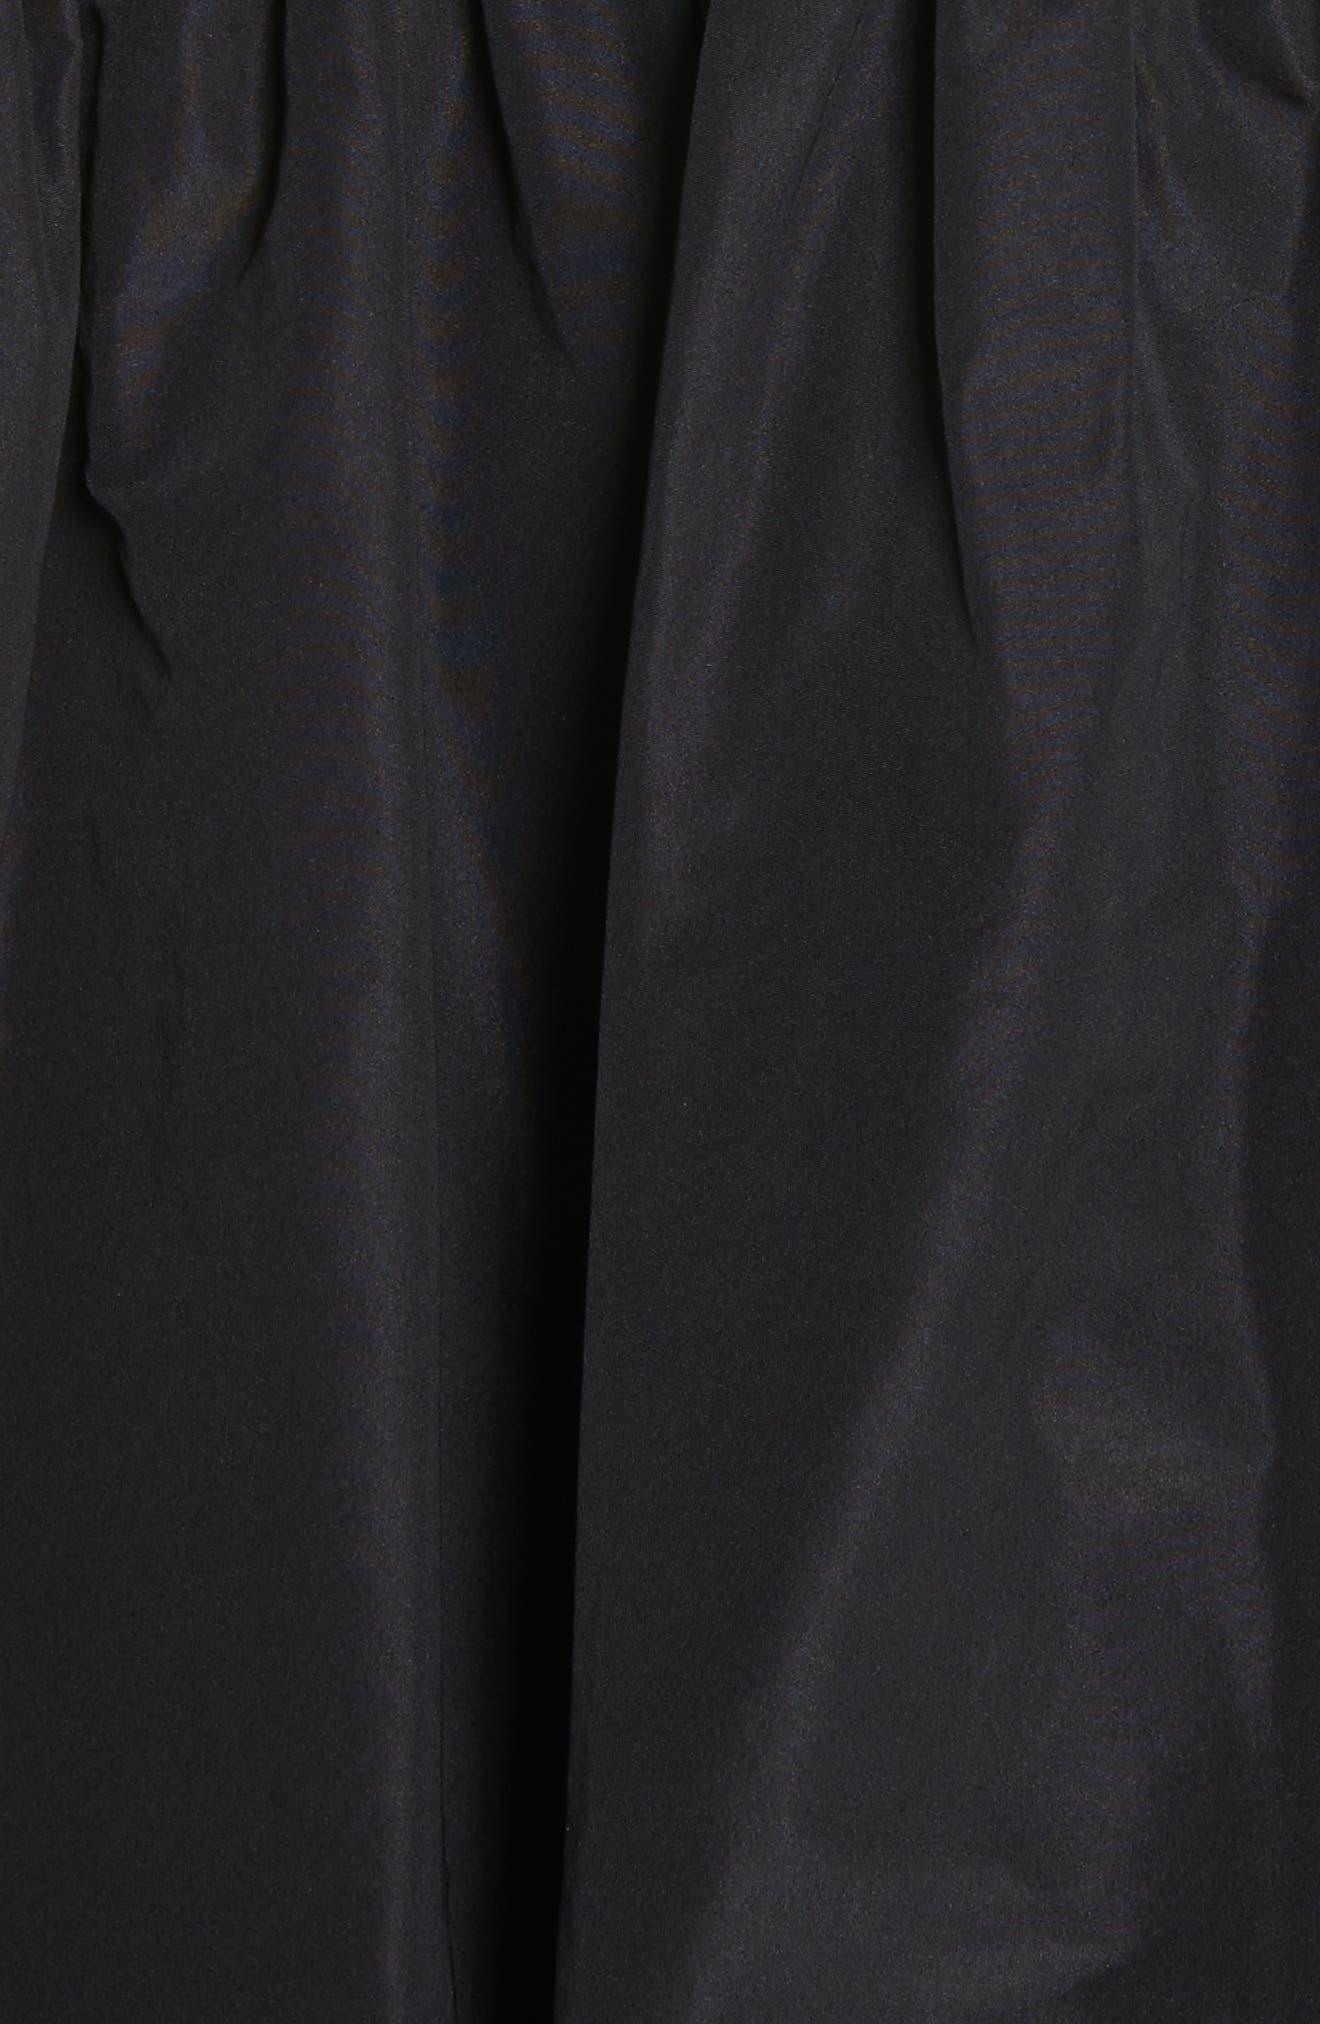 Pluto Taffeta Coat,                             Alternate thumbnail 6, color,                             001